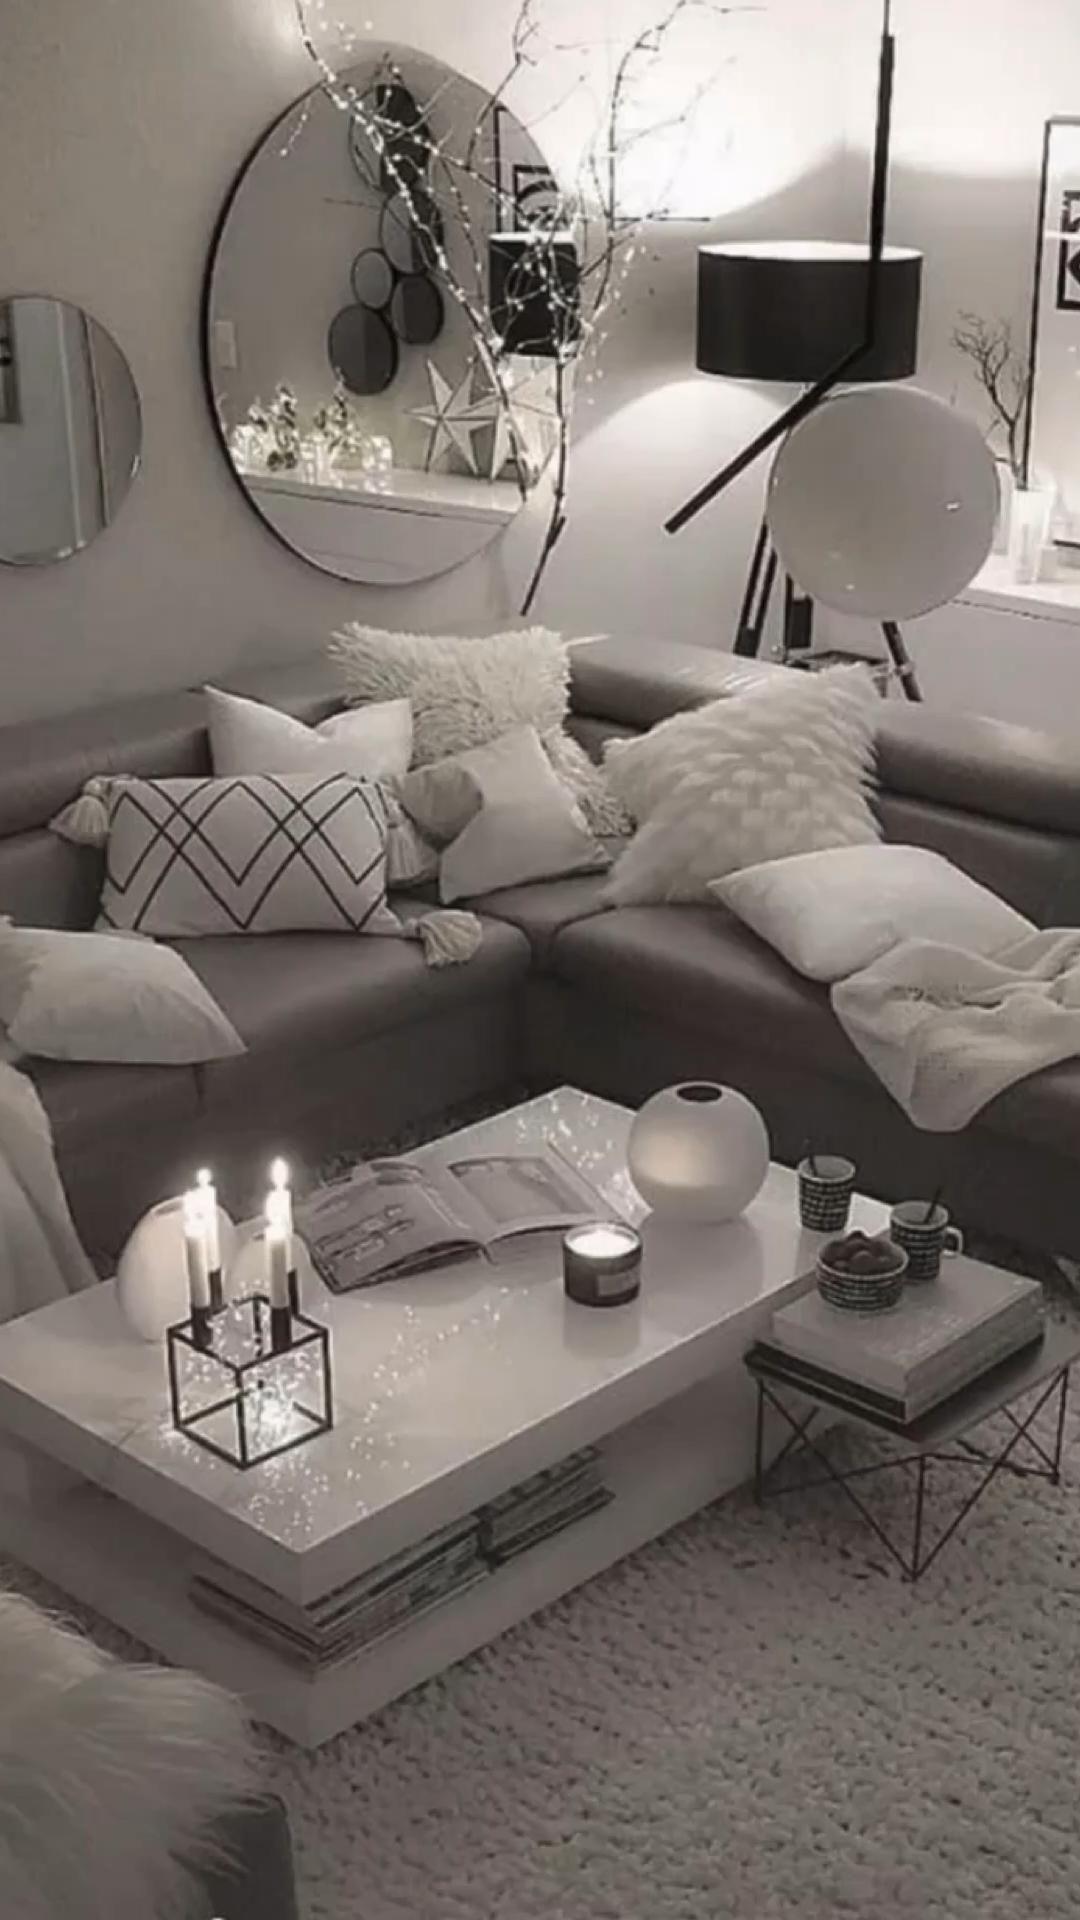 47 Charming Gray Living Room Design Ideas For Your Apartment | Gray living room design, Living room decor apartment, Elegant living room design